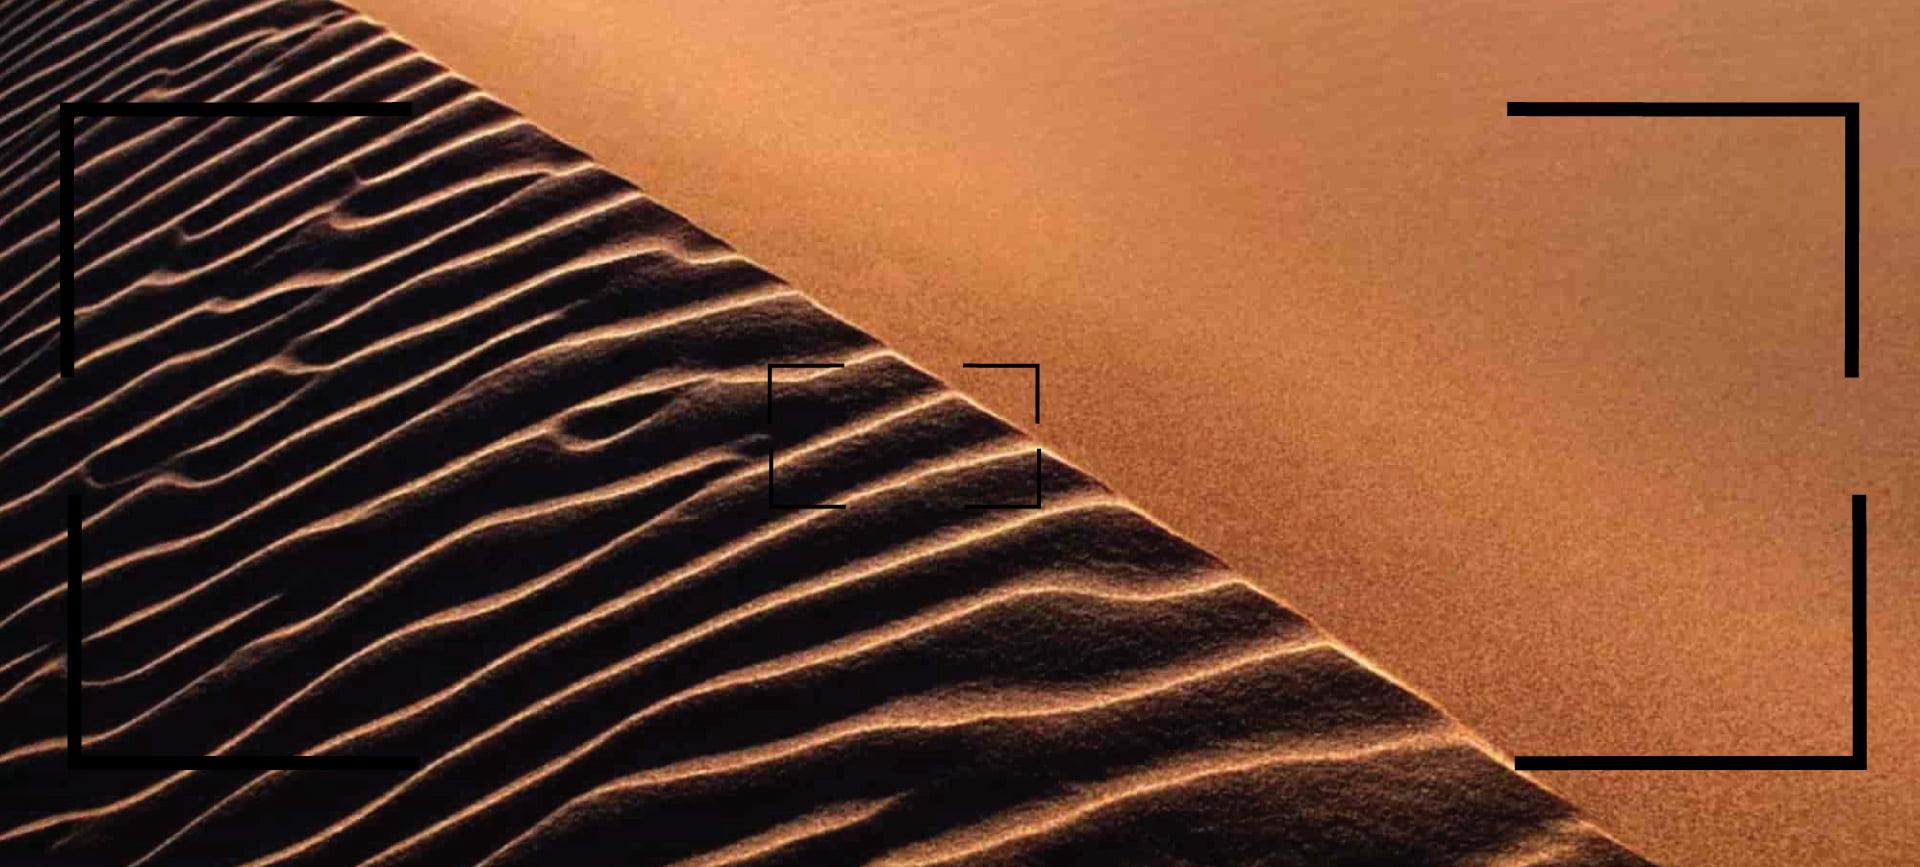 lines in photography compostion - عناصر ترکیب بندی در عکاسی